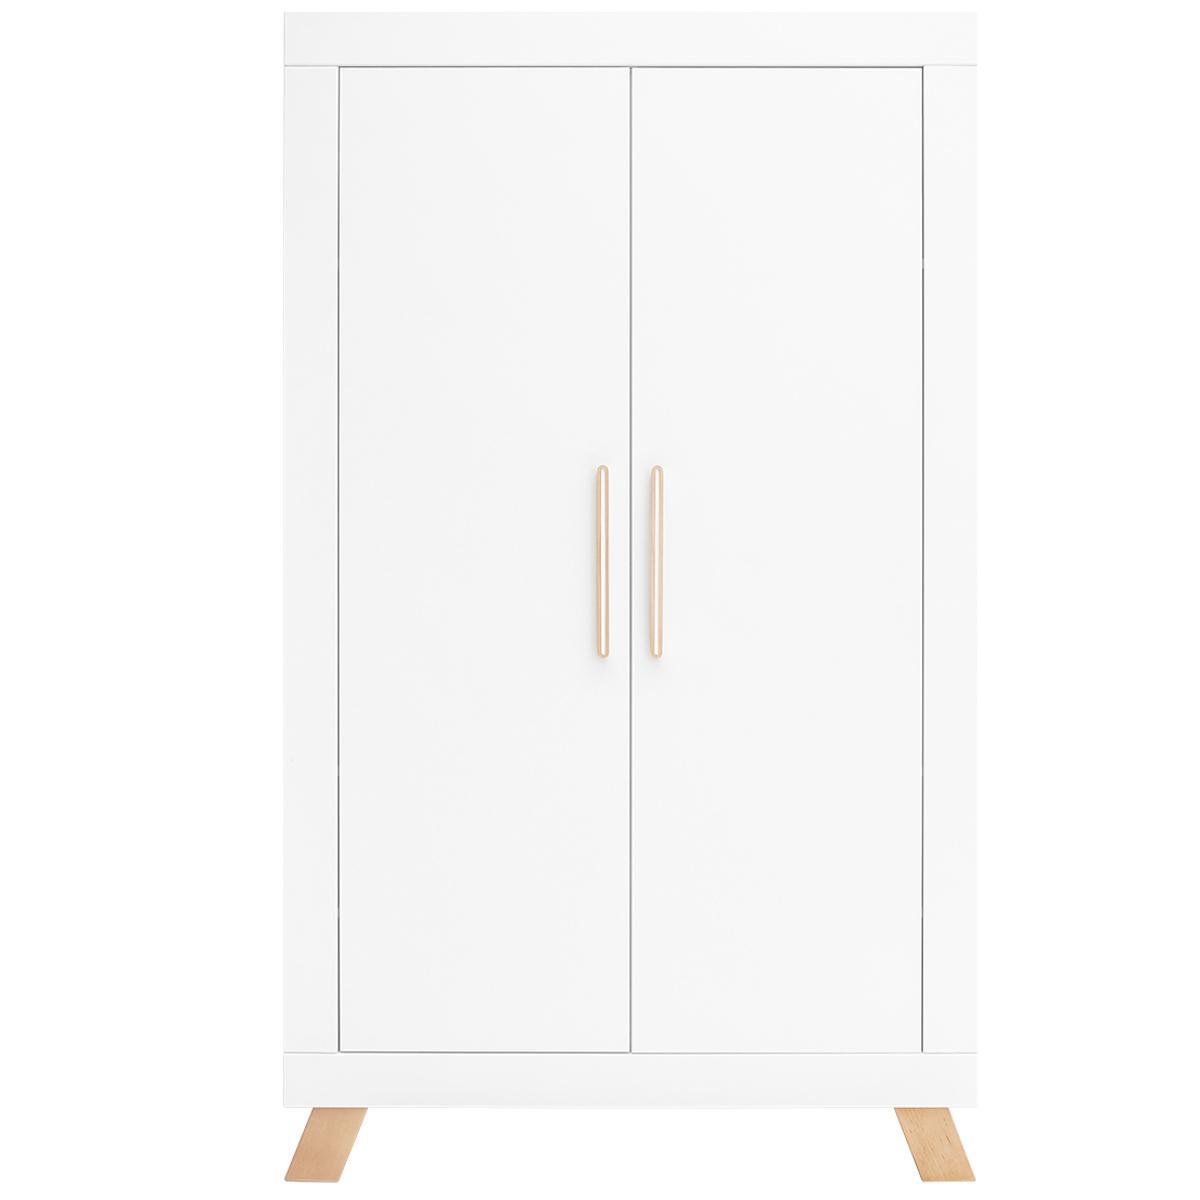 Armario 2 puertas LISA Bopita blanco-natural